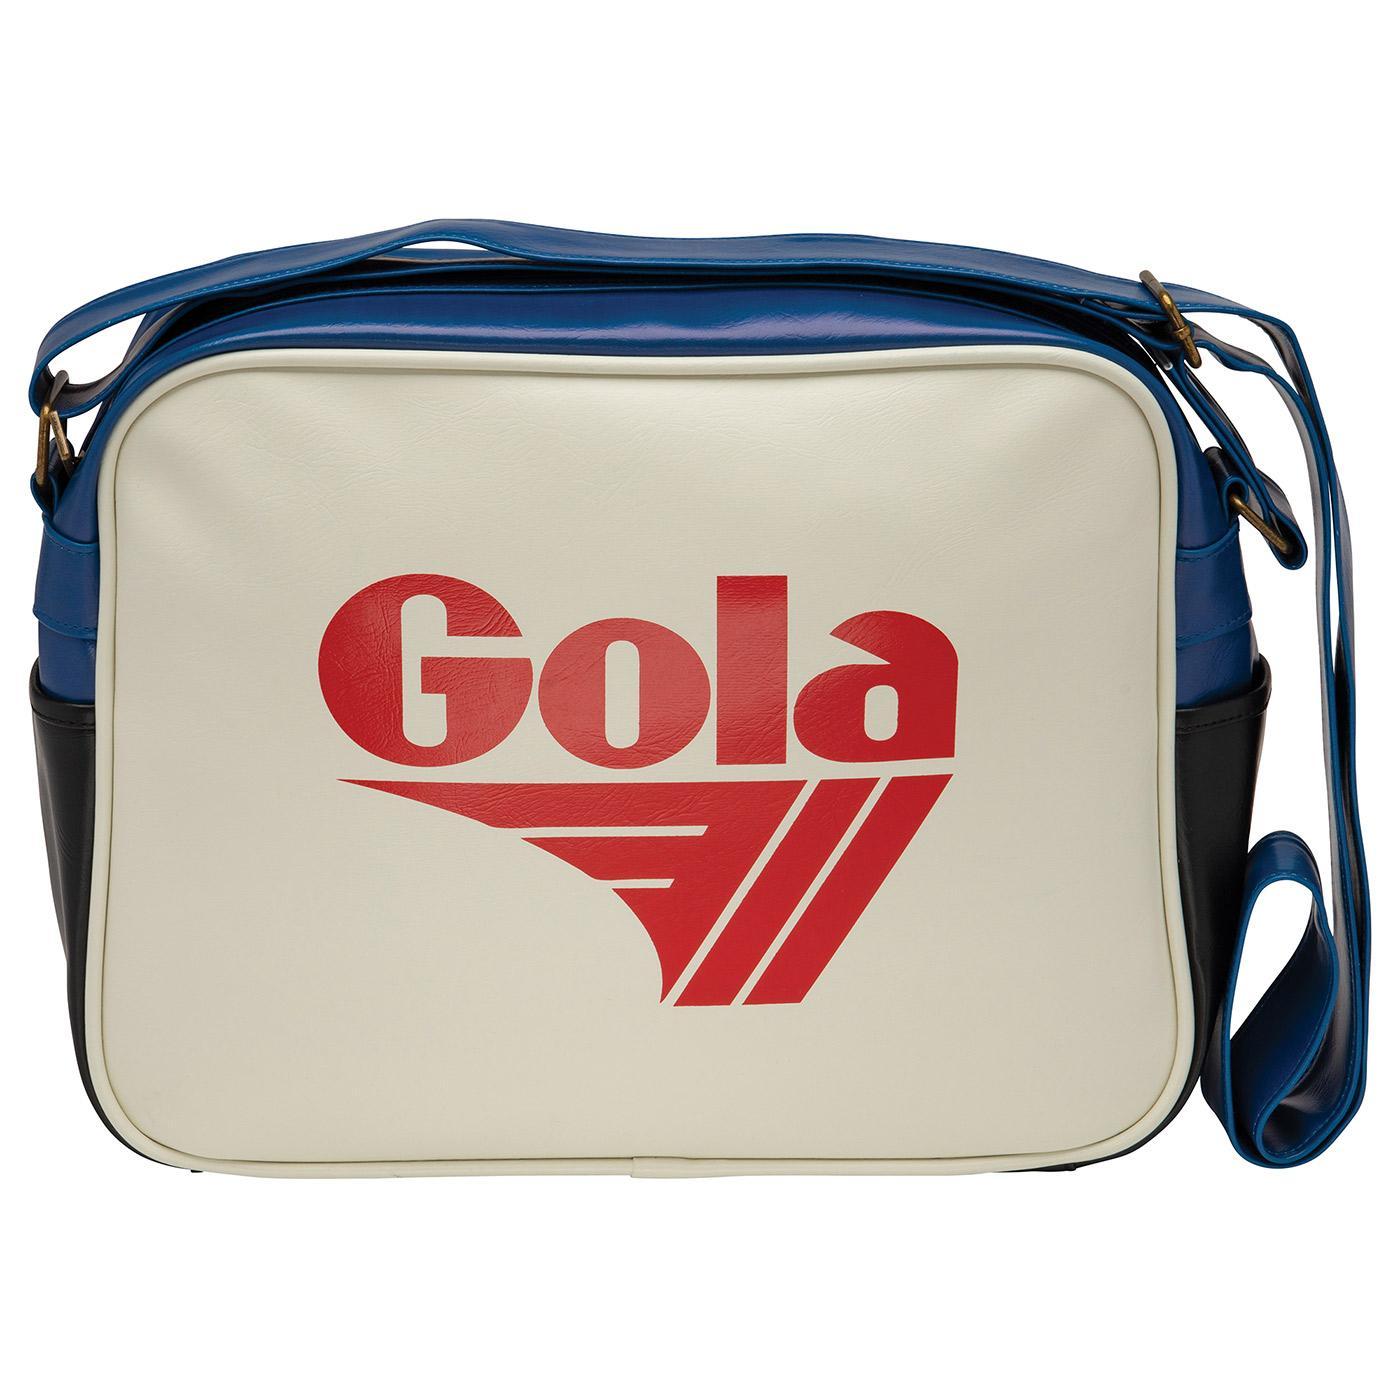 GOLA Redford Retro 1970s Shoulder Bag (OW/DR)